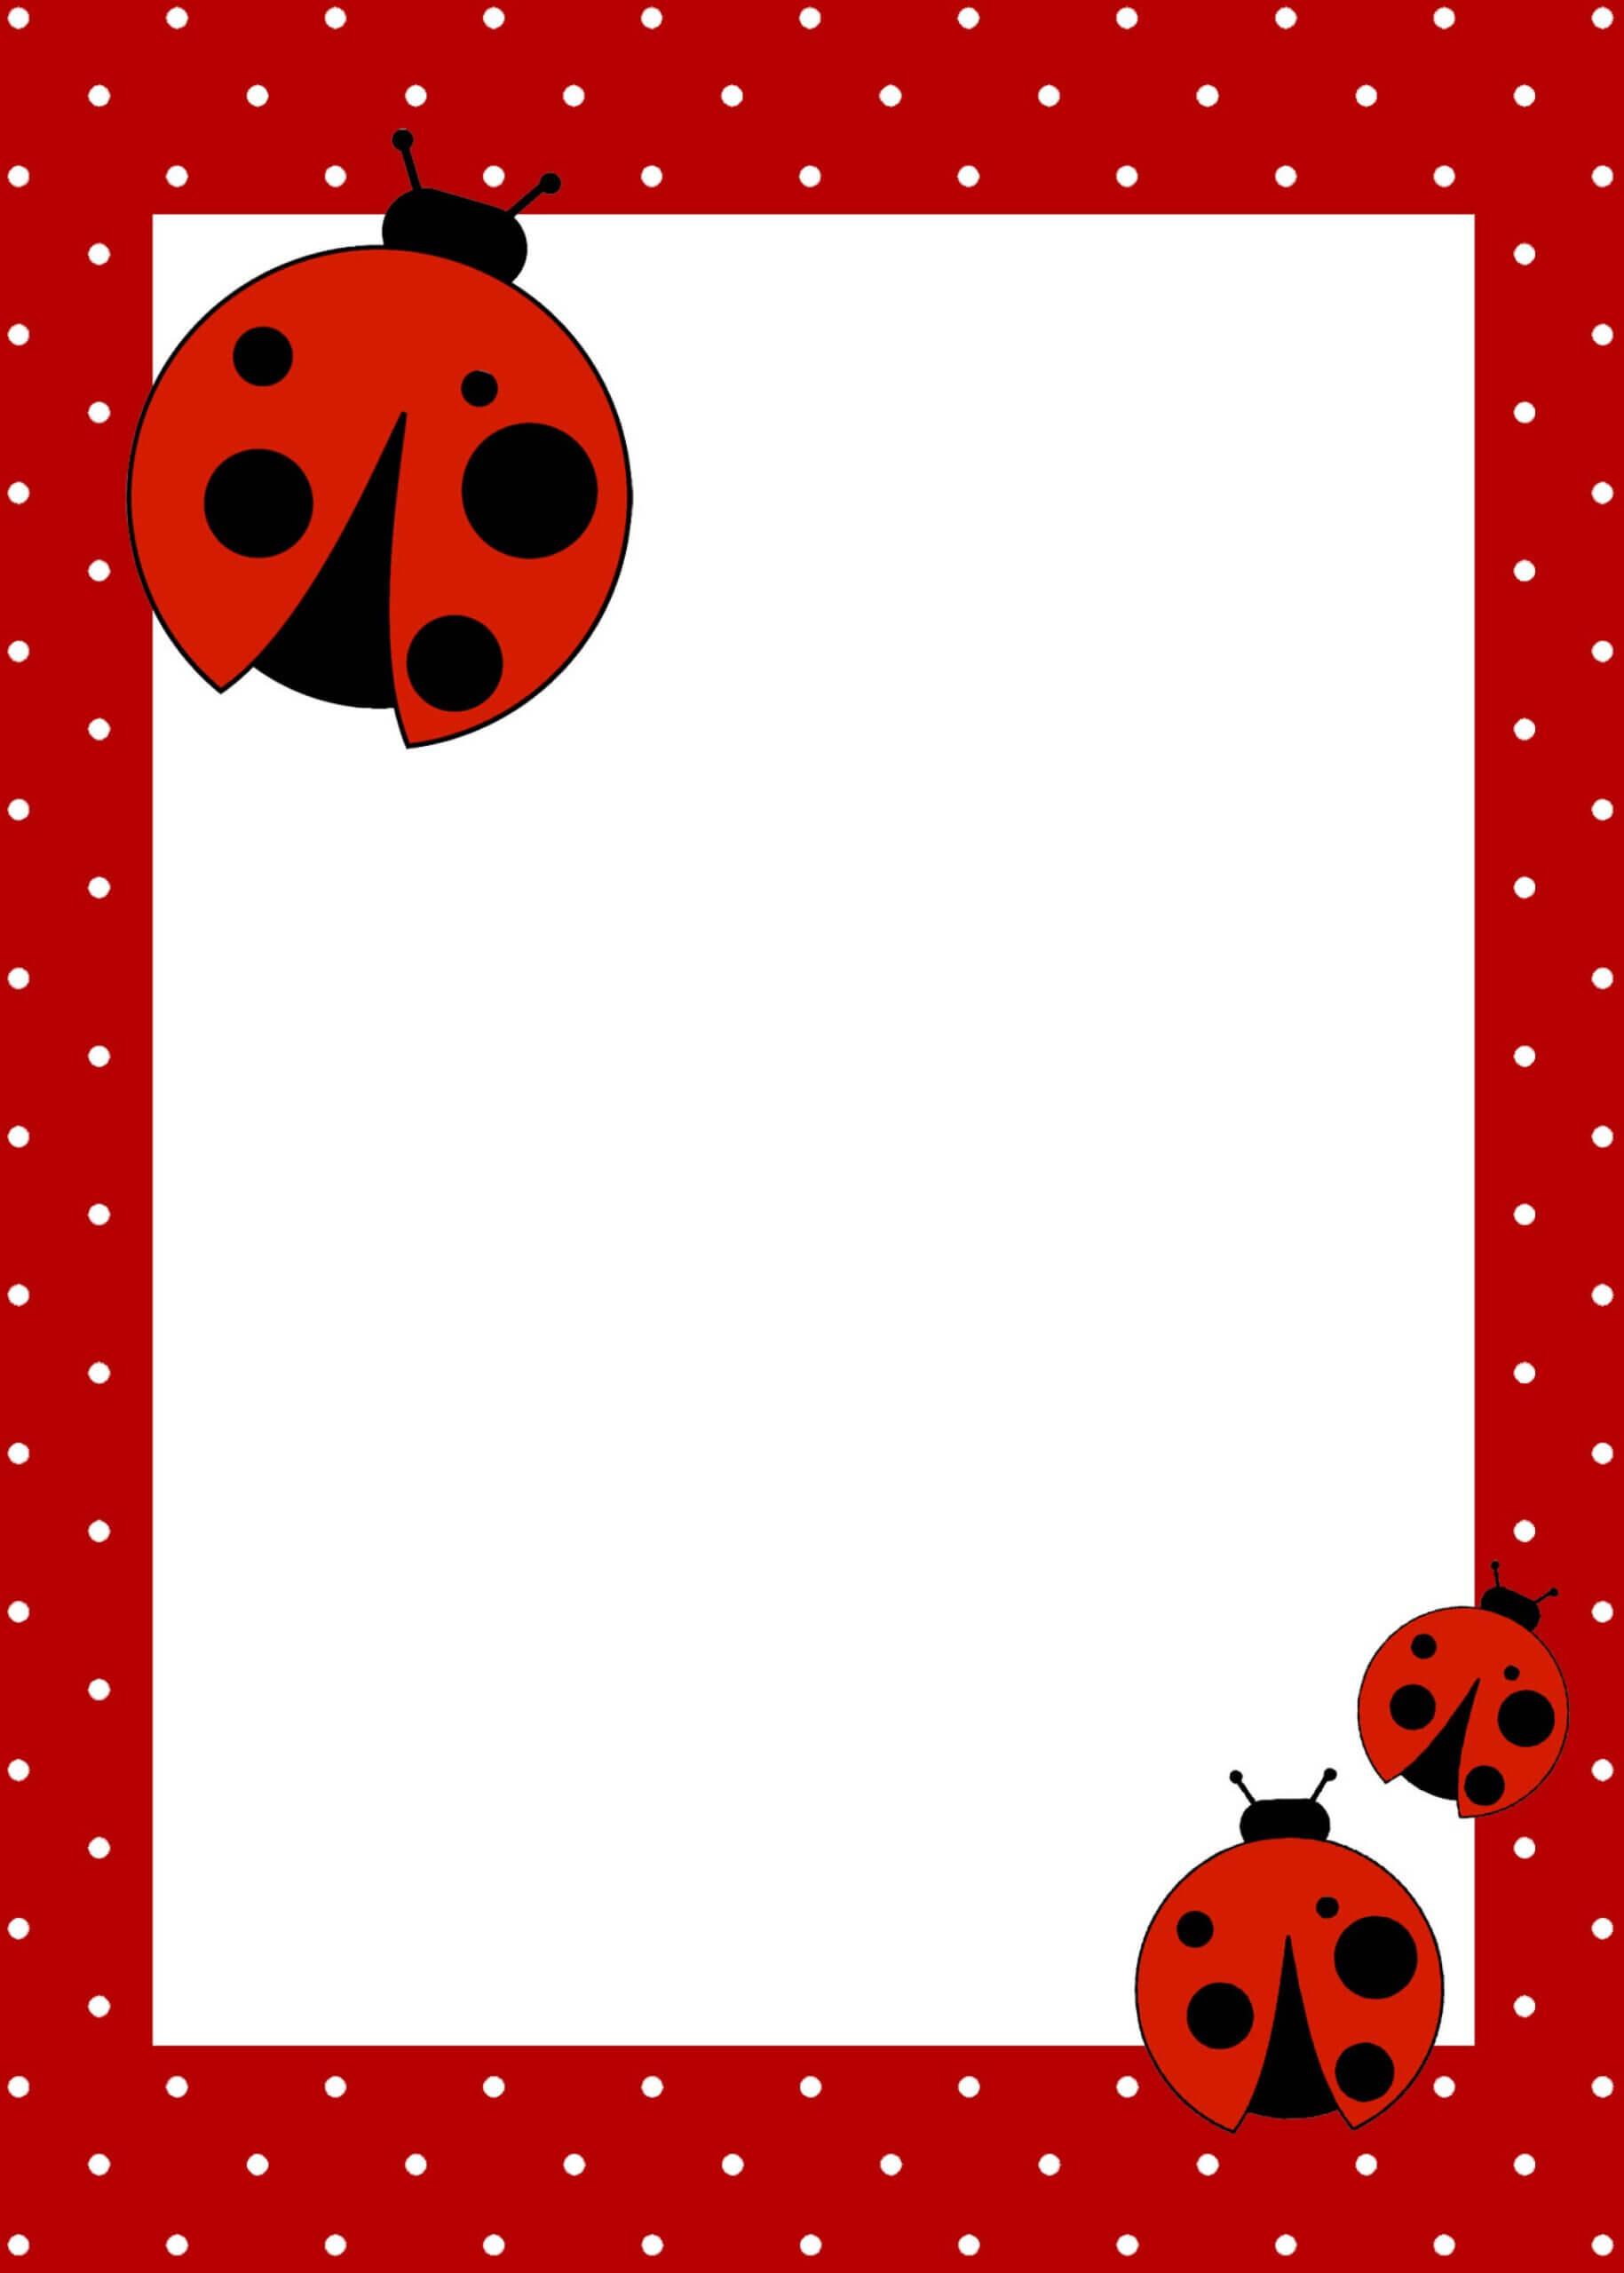 020 1St Birthday Invitation Background Designs Blank For Boy For Blank Ladybug Template